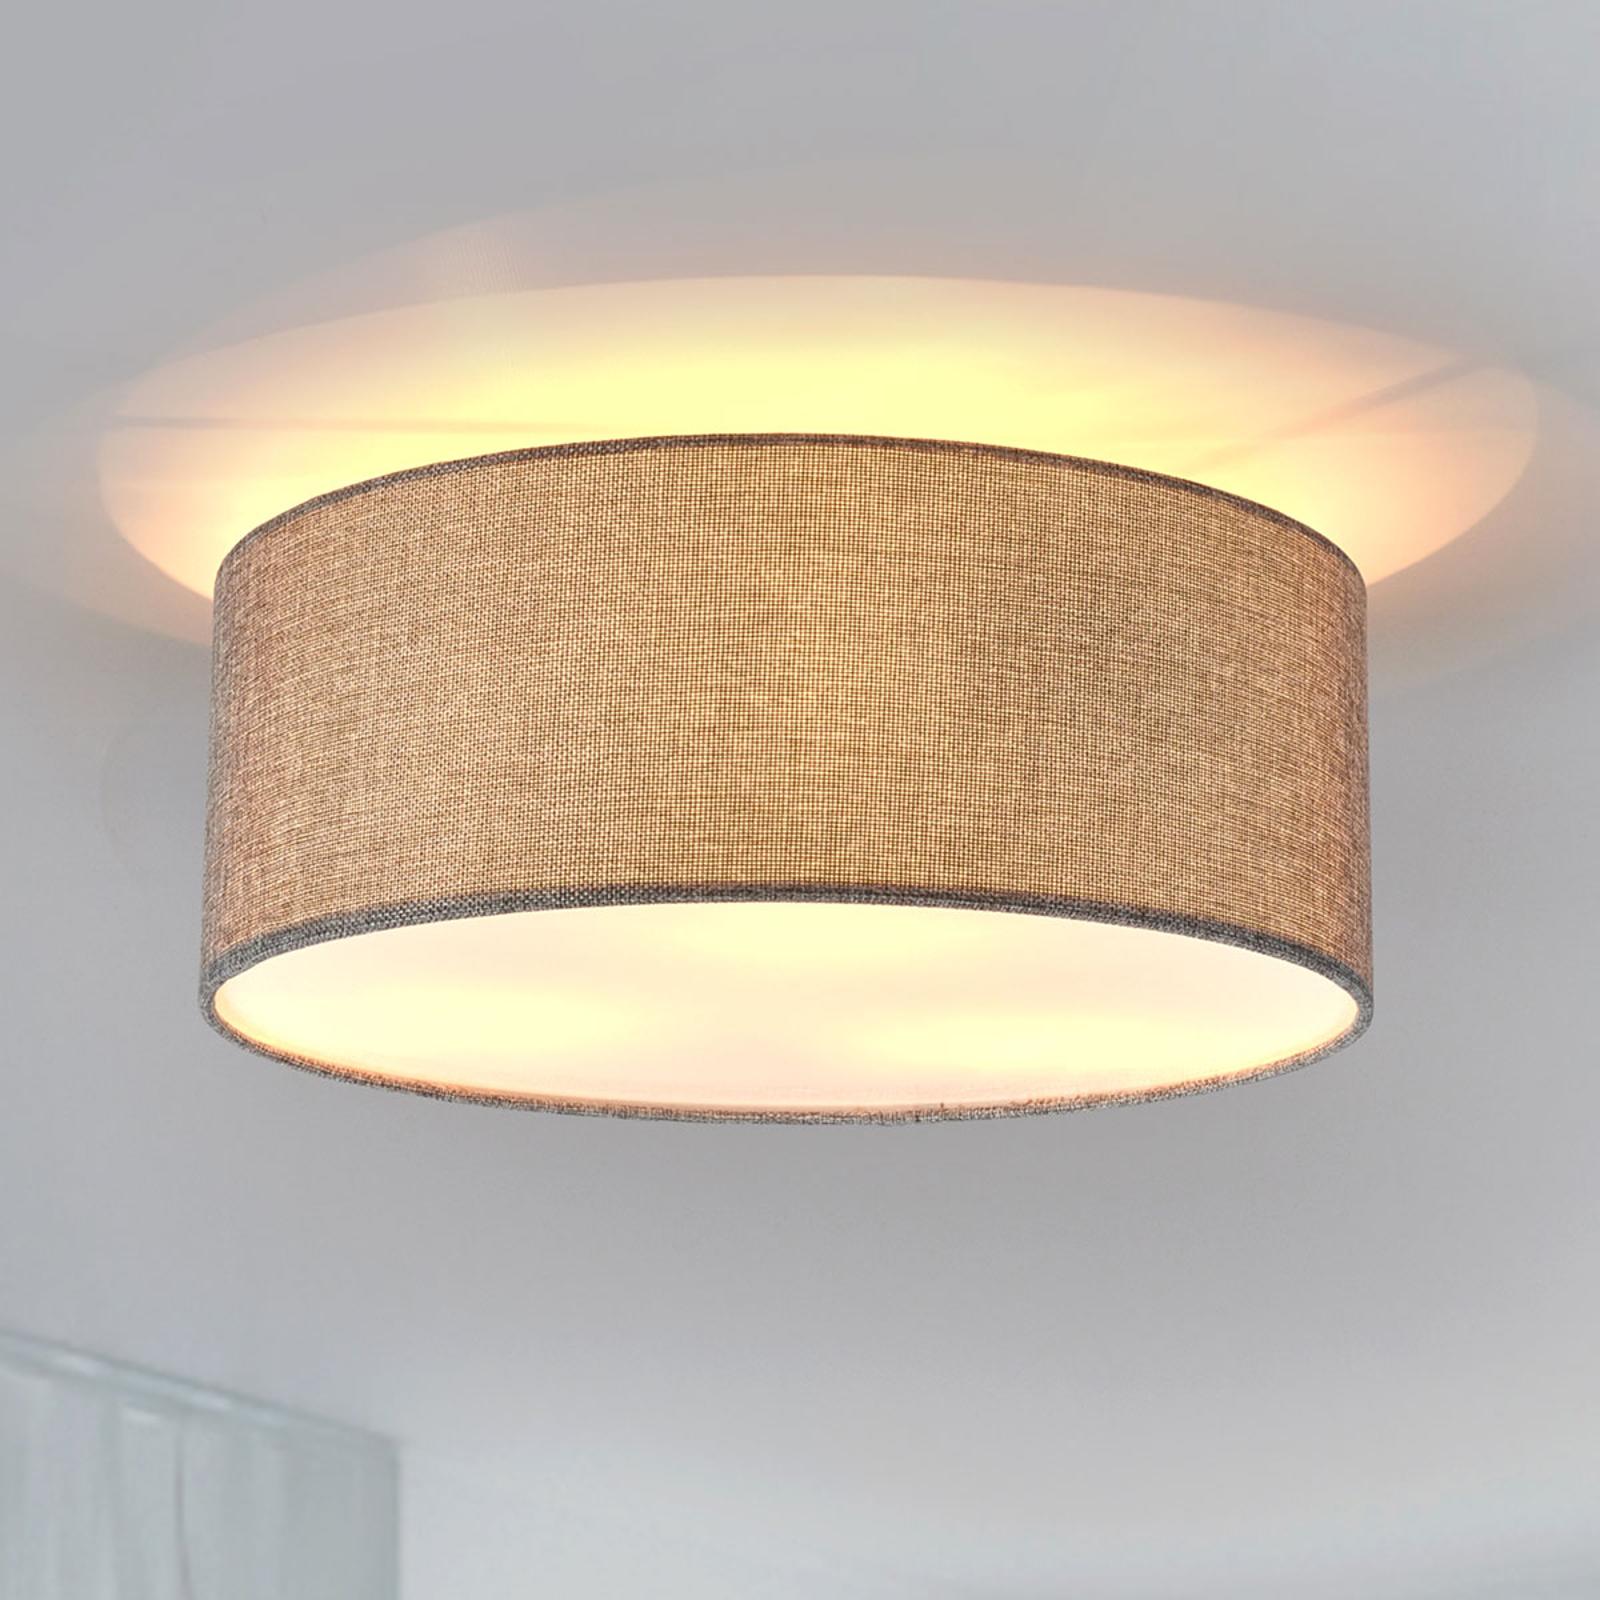 Lampa sufitowa Henrika z szarej tkaniny